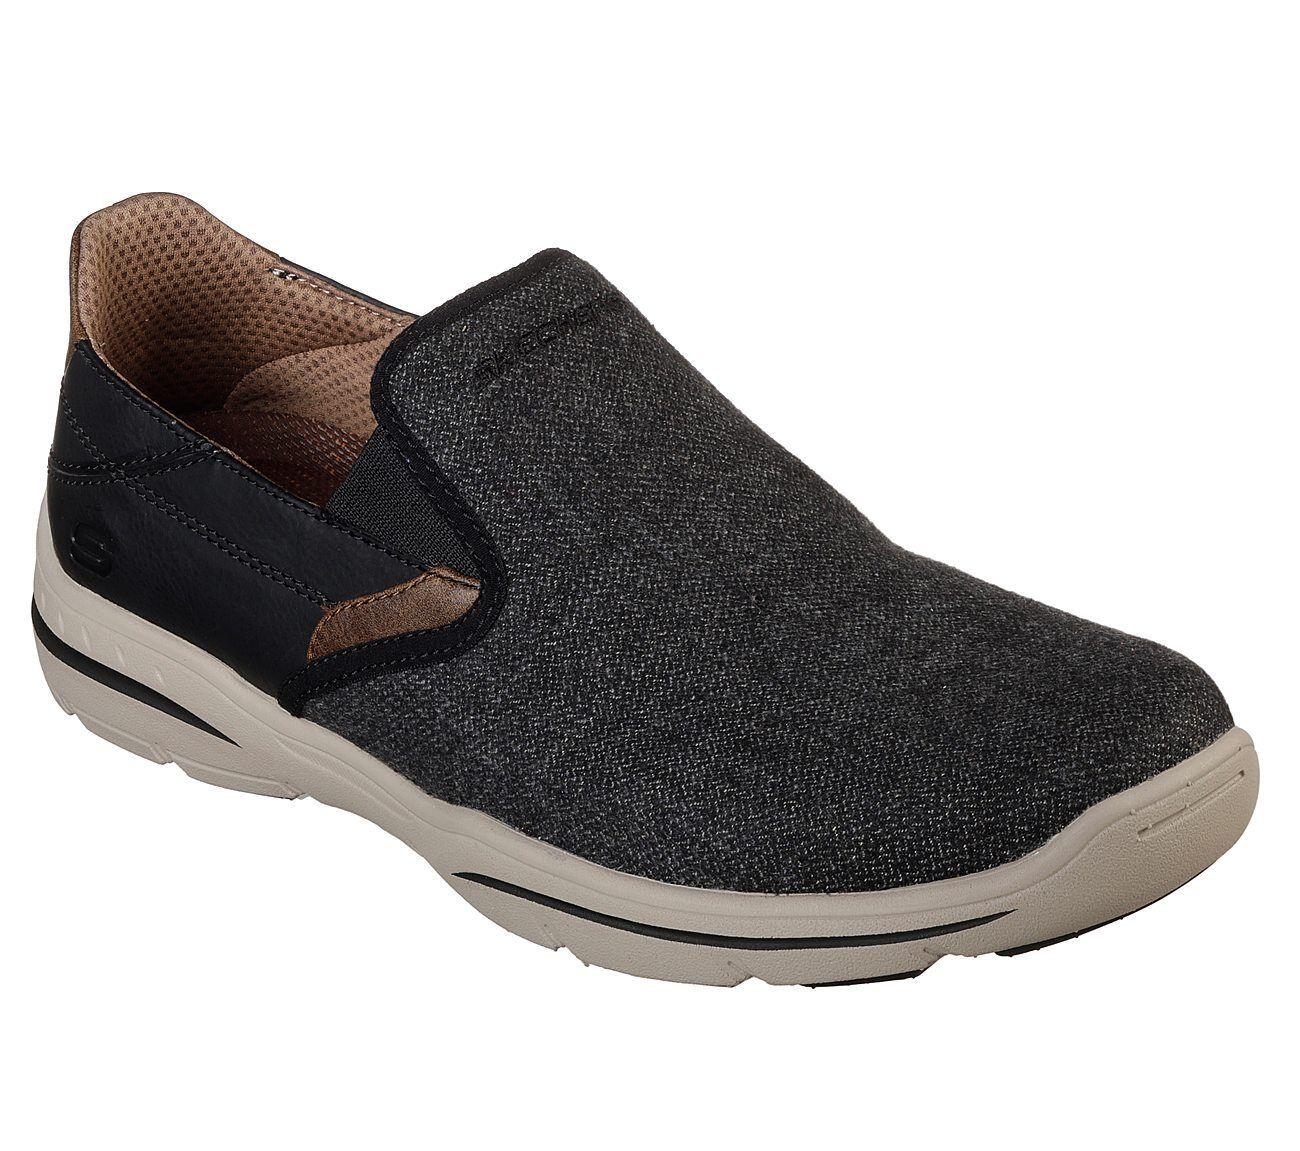 65579 Black Skechers shoes Men Canvas Memory Foam Slip On Comfort Loafer Casual